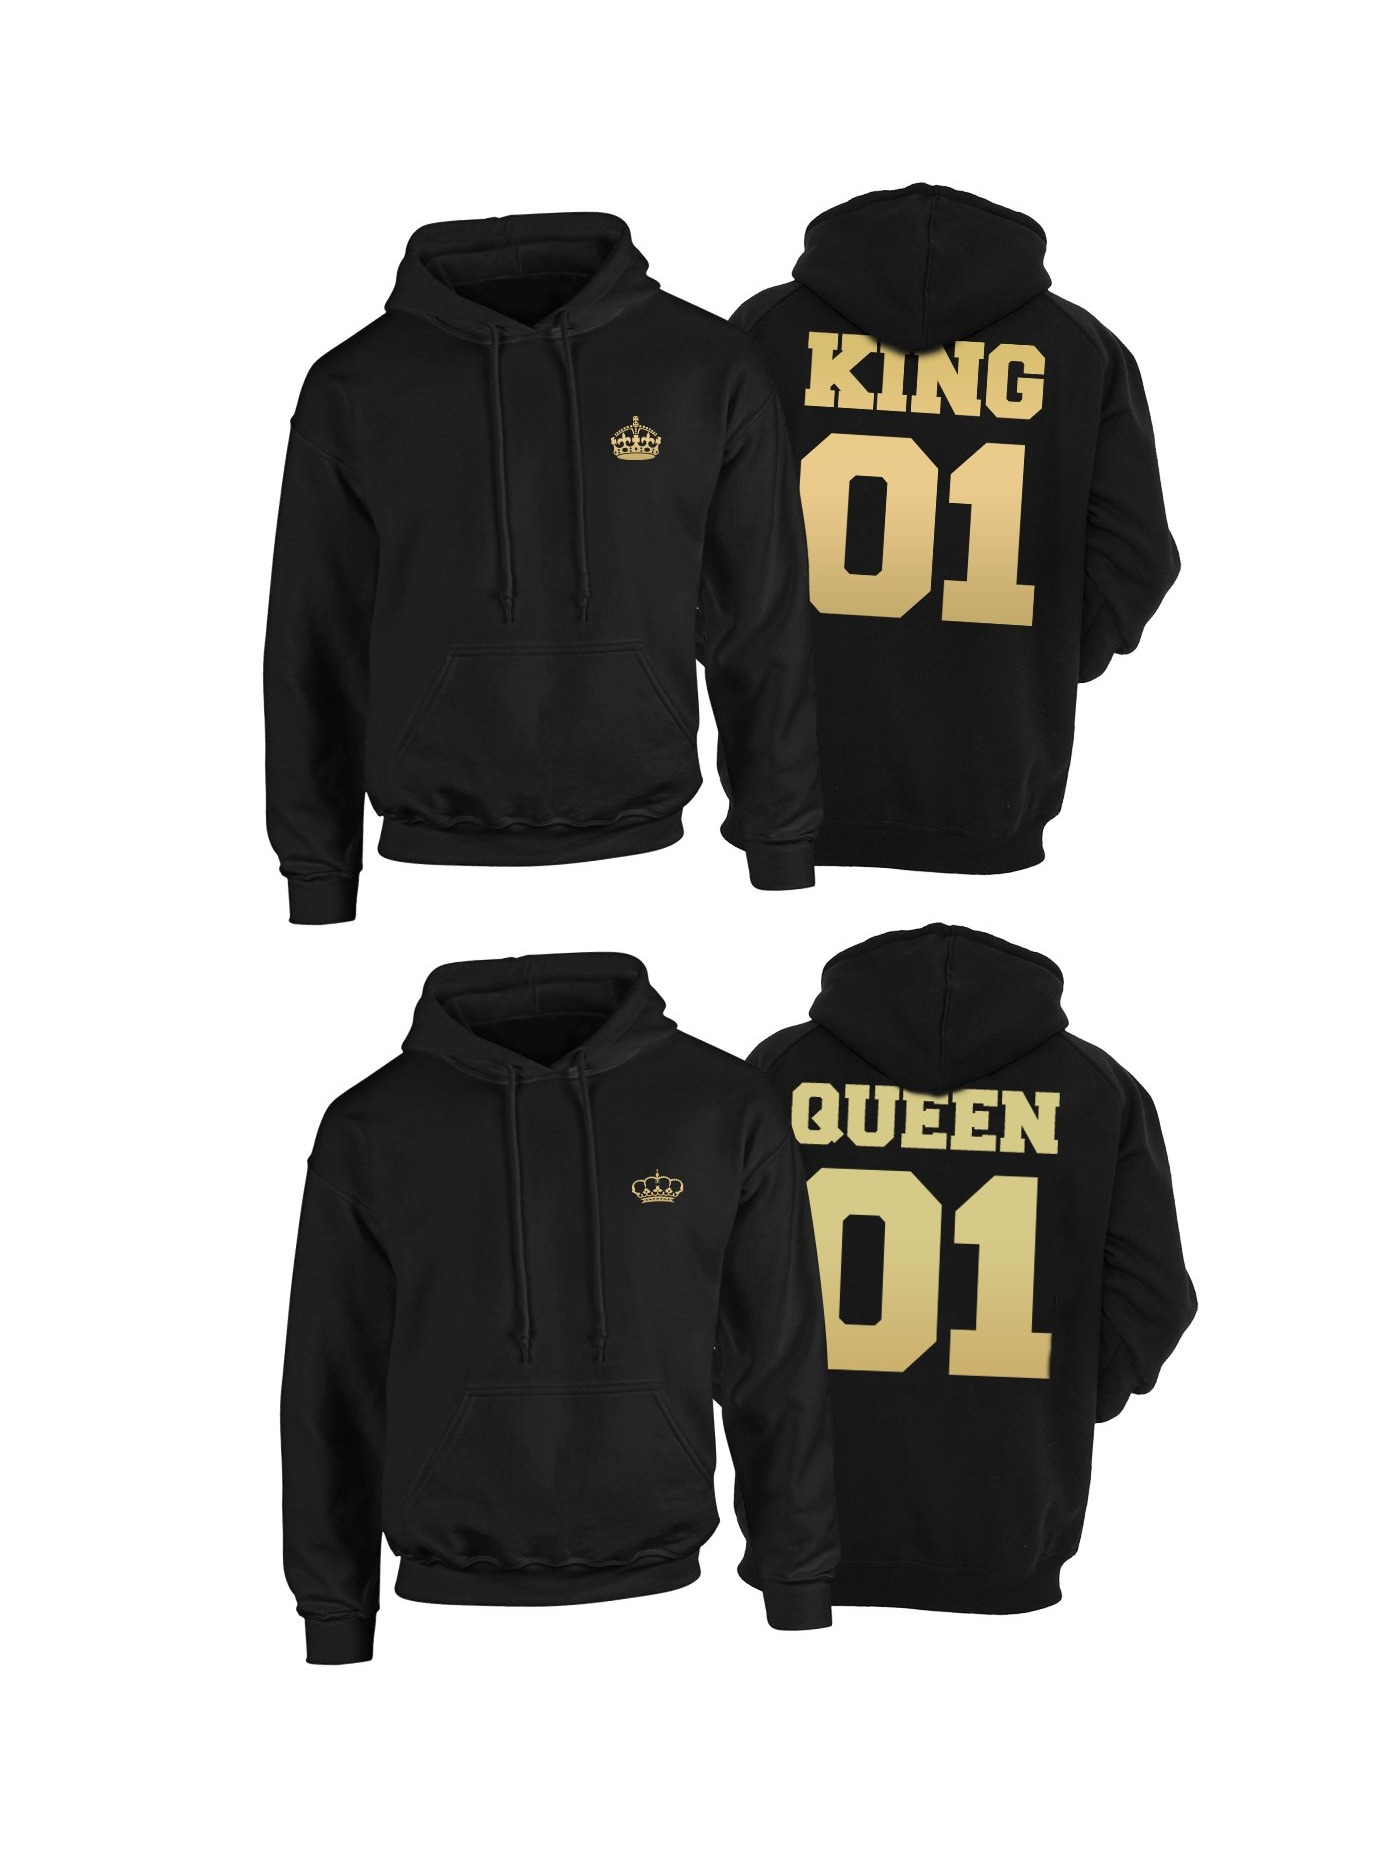 d88921ba08f7 Hoodies for couple King Queen 01